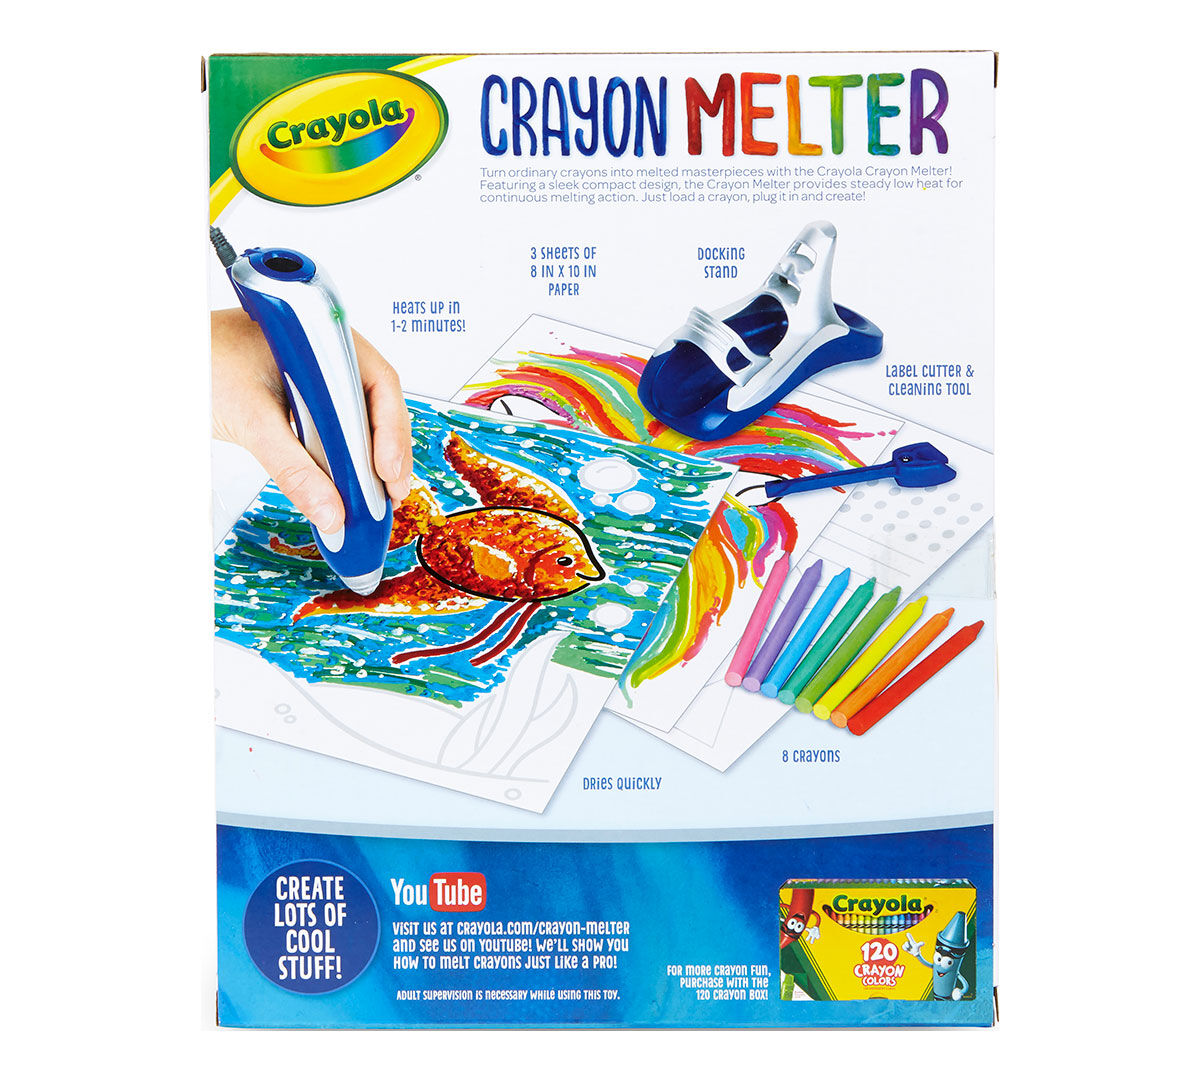 Crayola Crayon Melter, Create Art With Melted Crayons, 1 Crayon ...